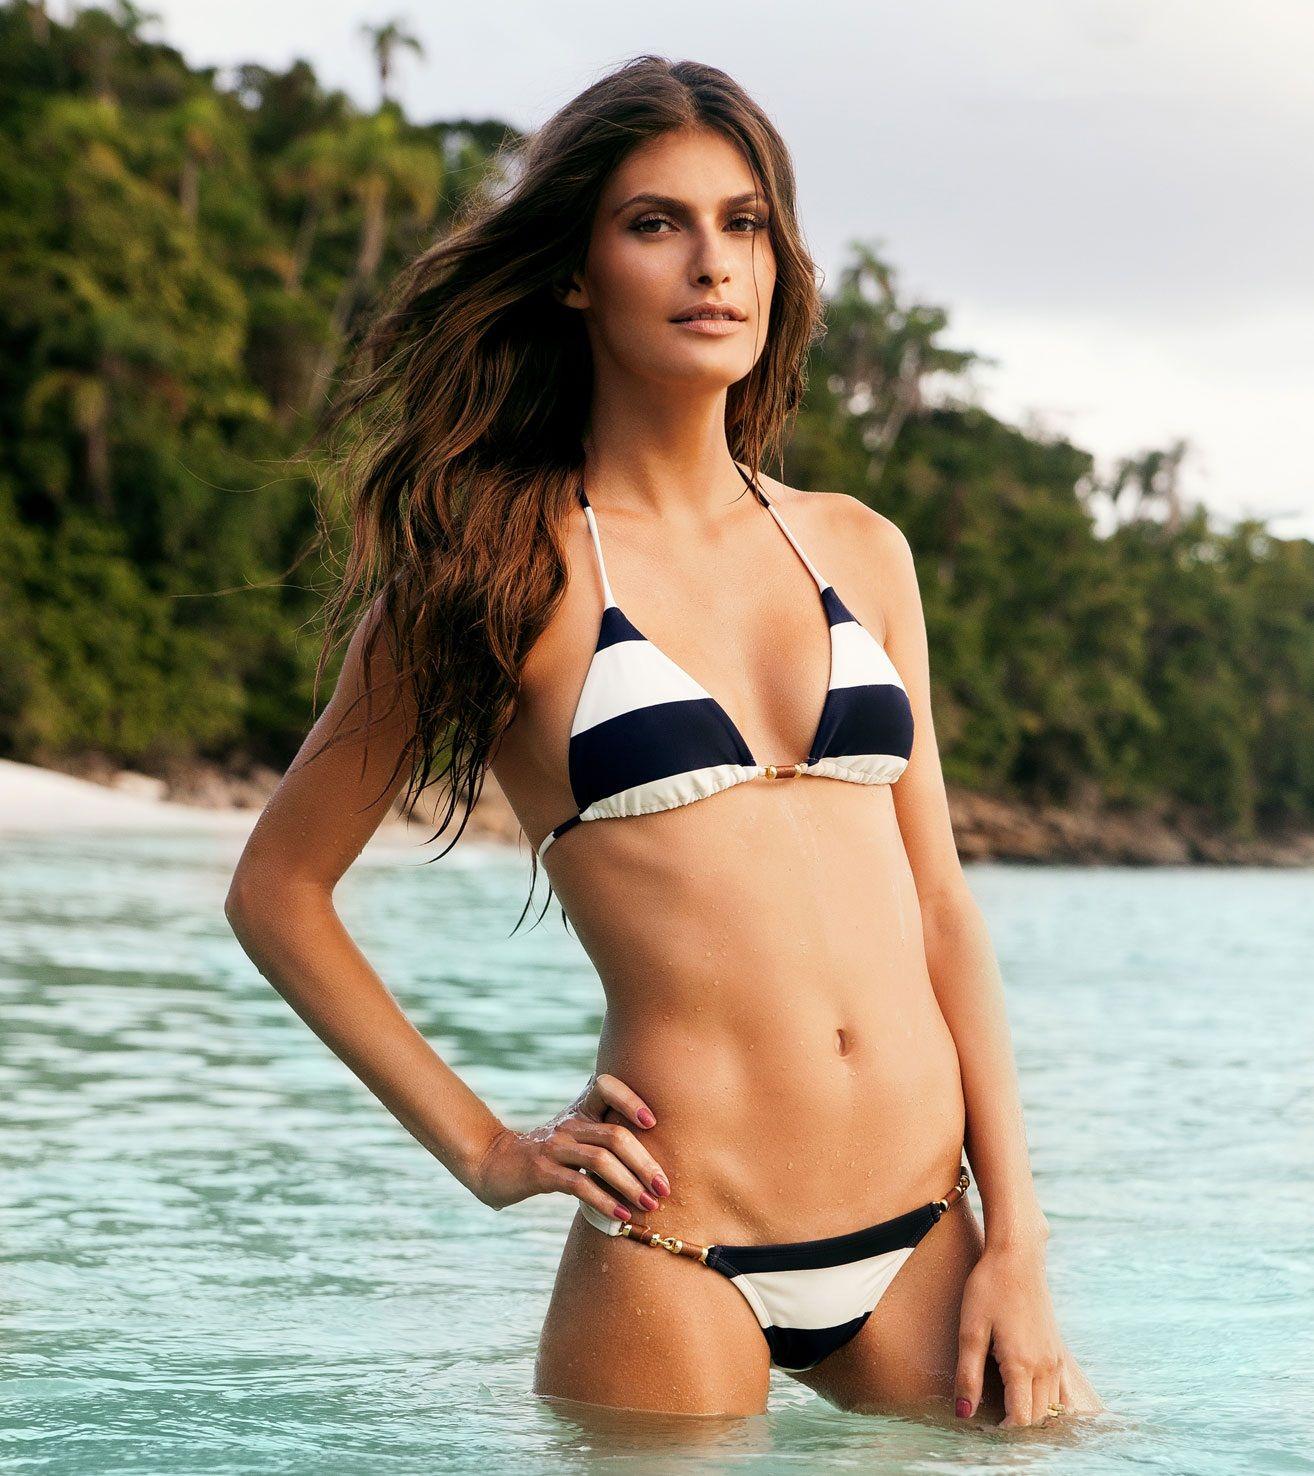 Daniela hantuchova vix bikini share